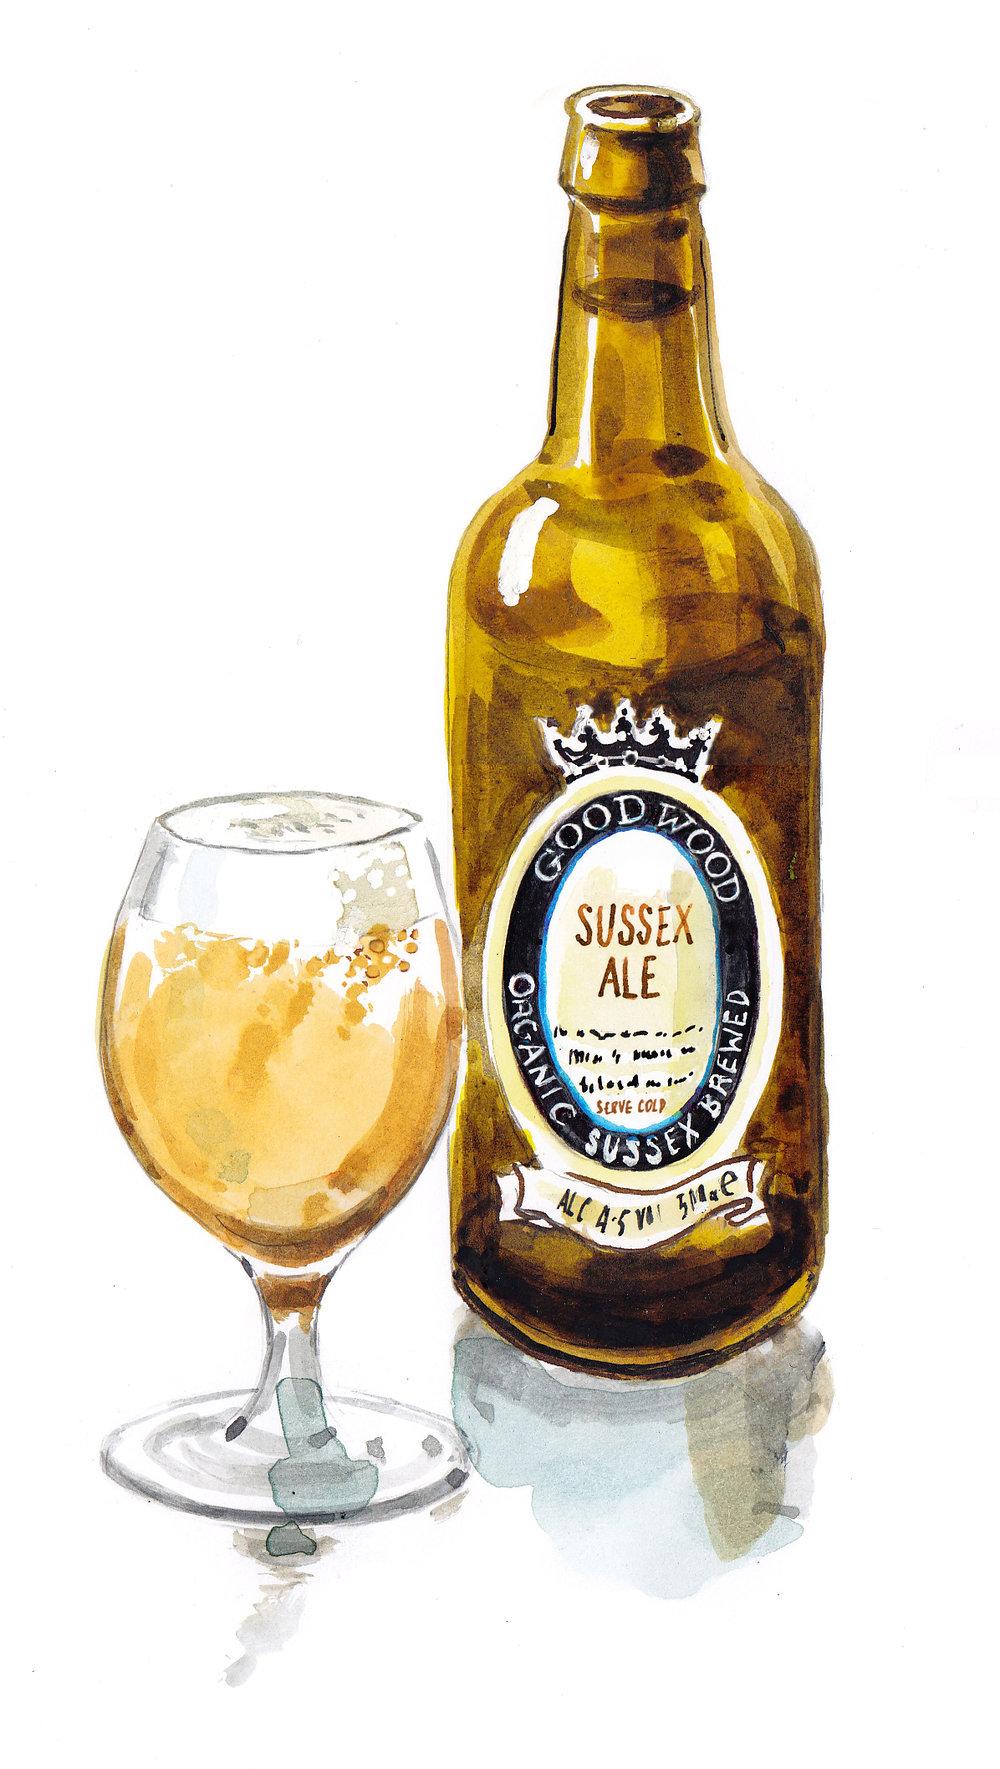 Sussex Ale